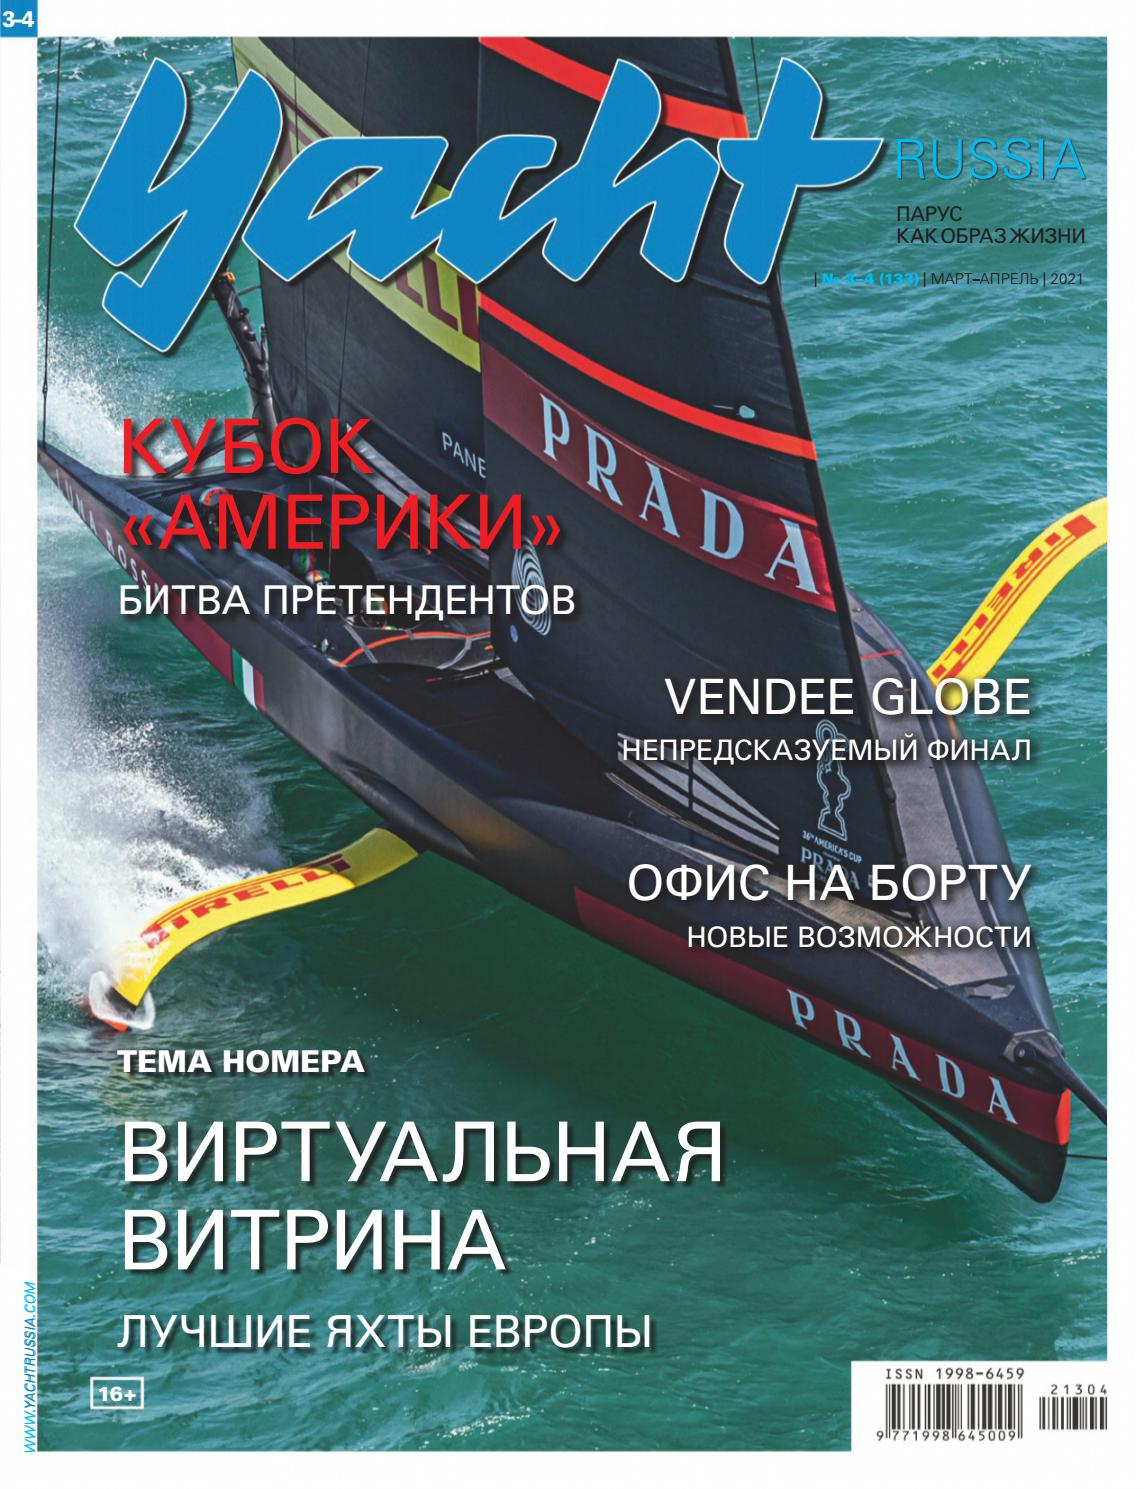 Yacht Russia №3-4. март-апрель 2021